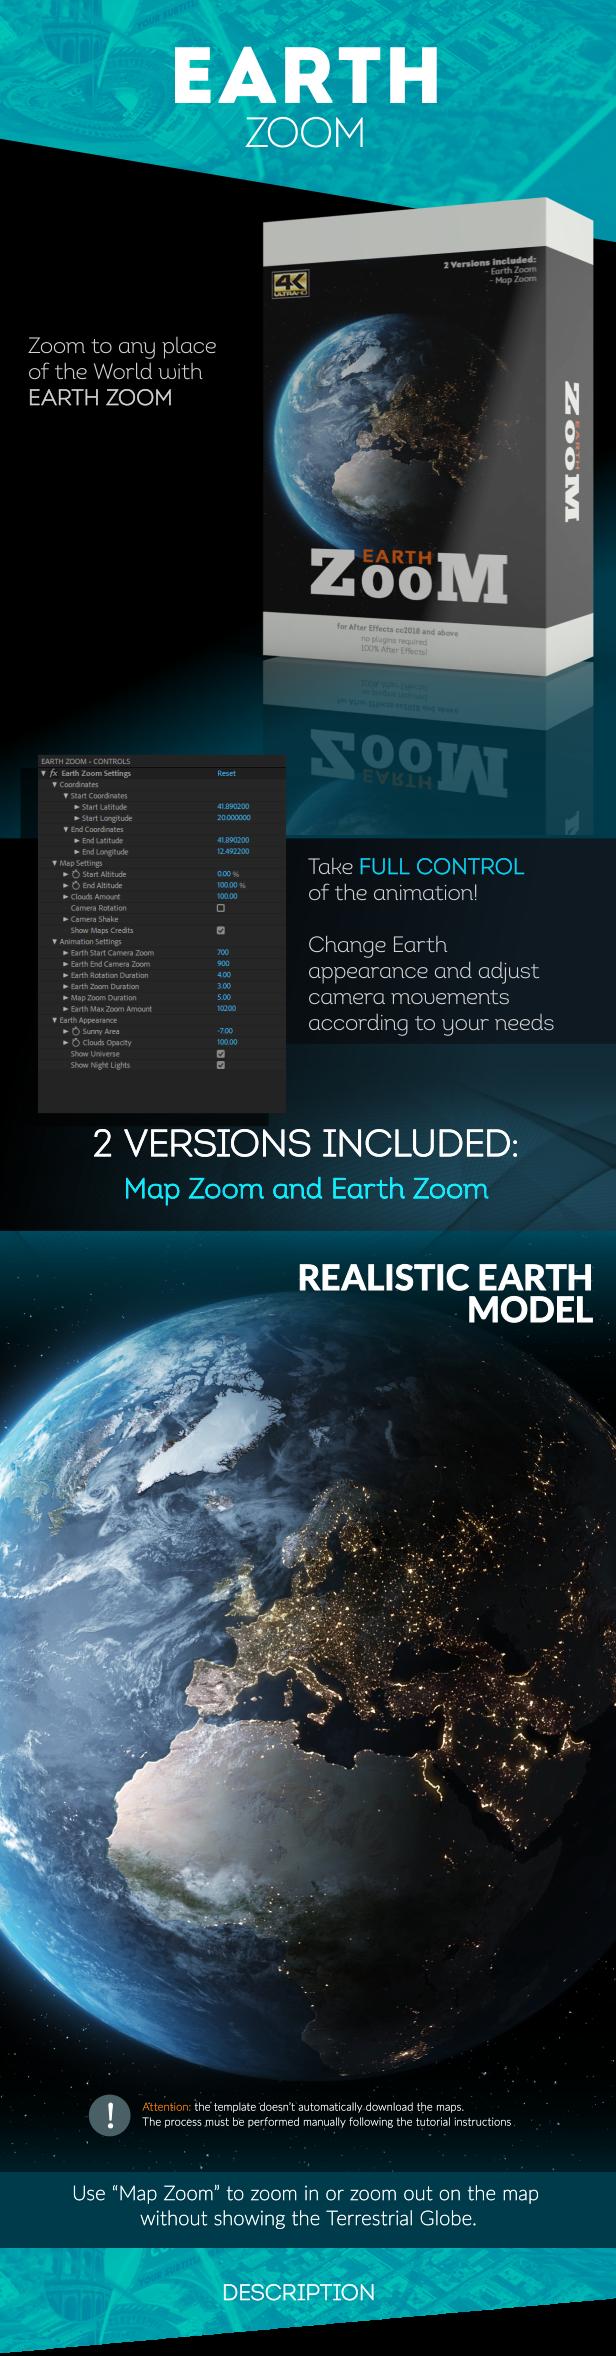 创意地球冲击地图连线路径地点方位标注动画AE模板素材 Videohive – Animated Map Toolkit插图3